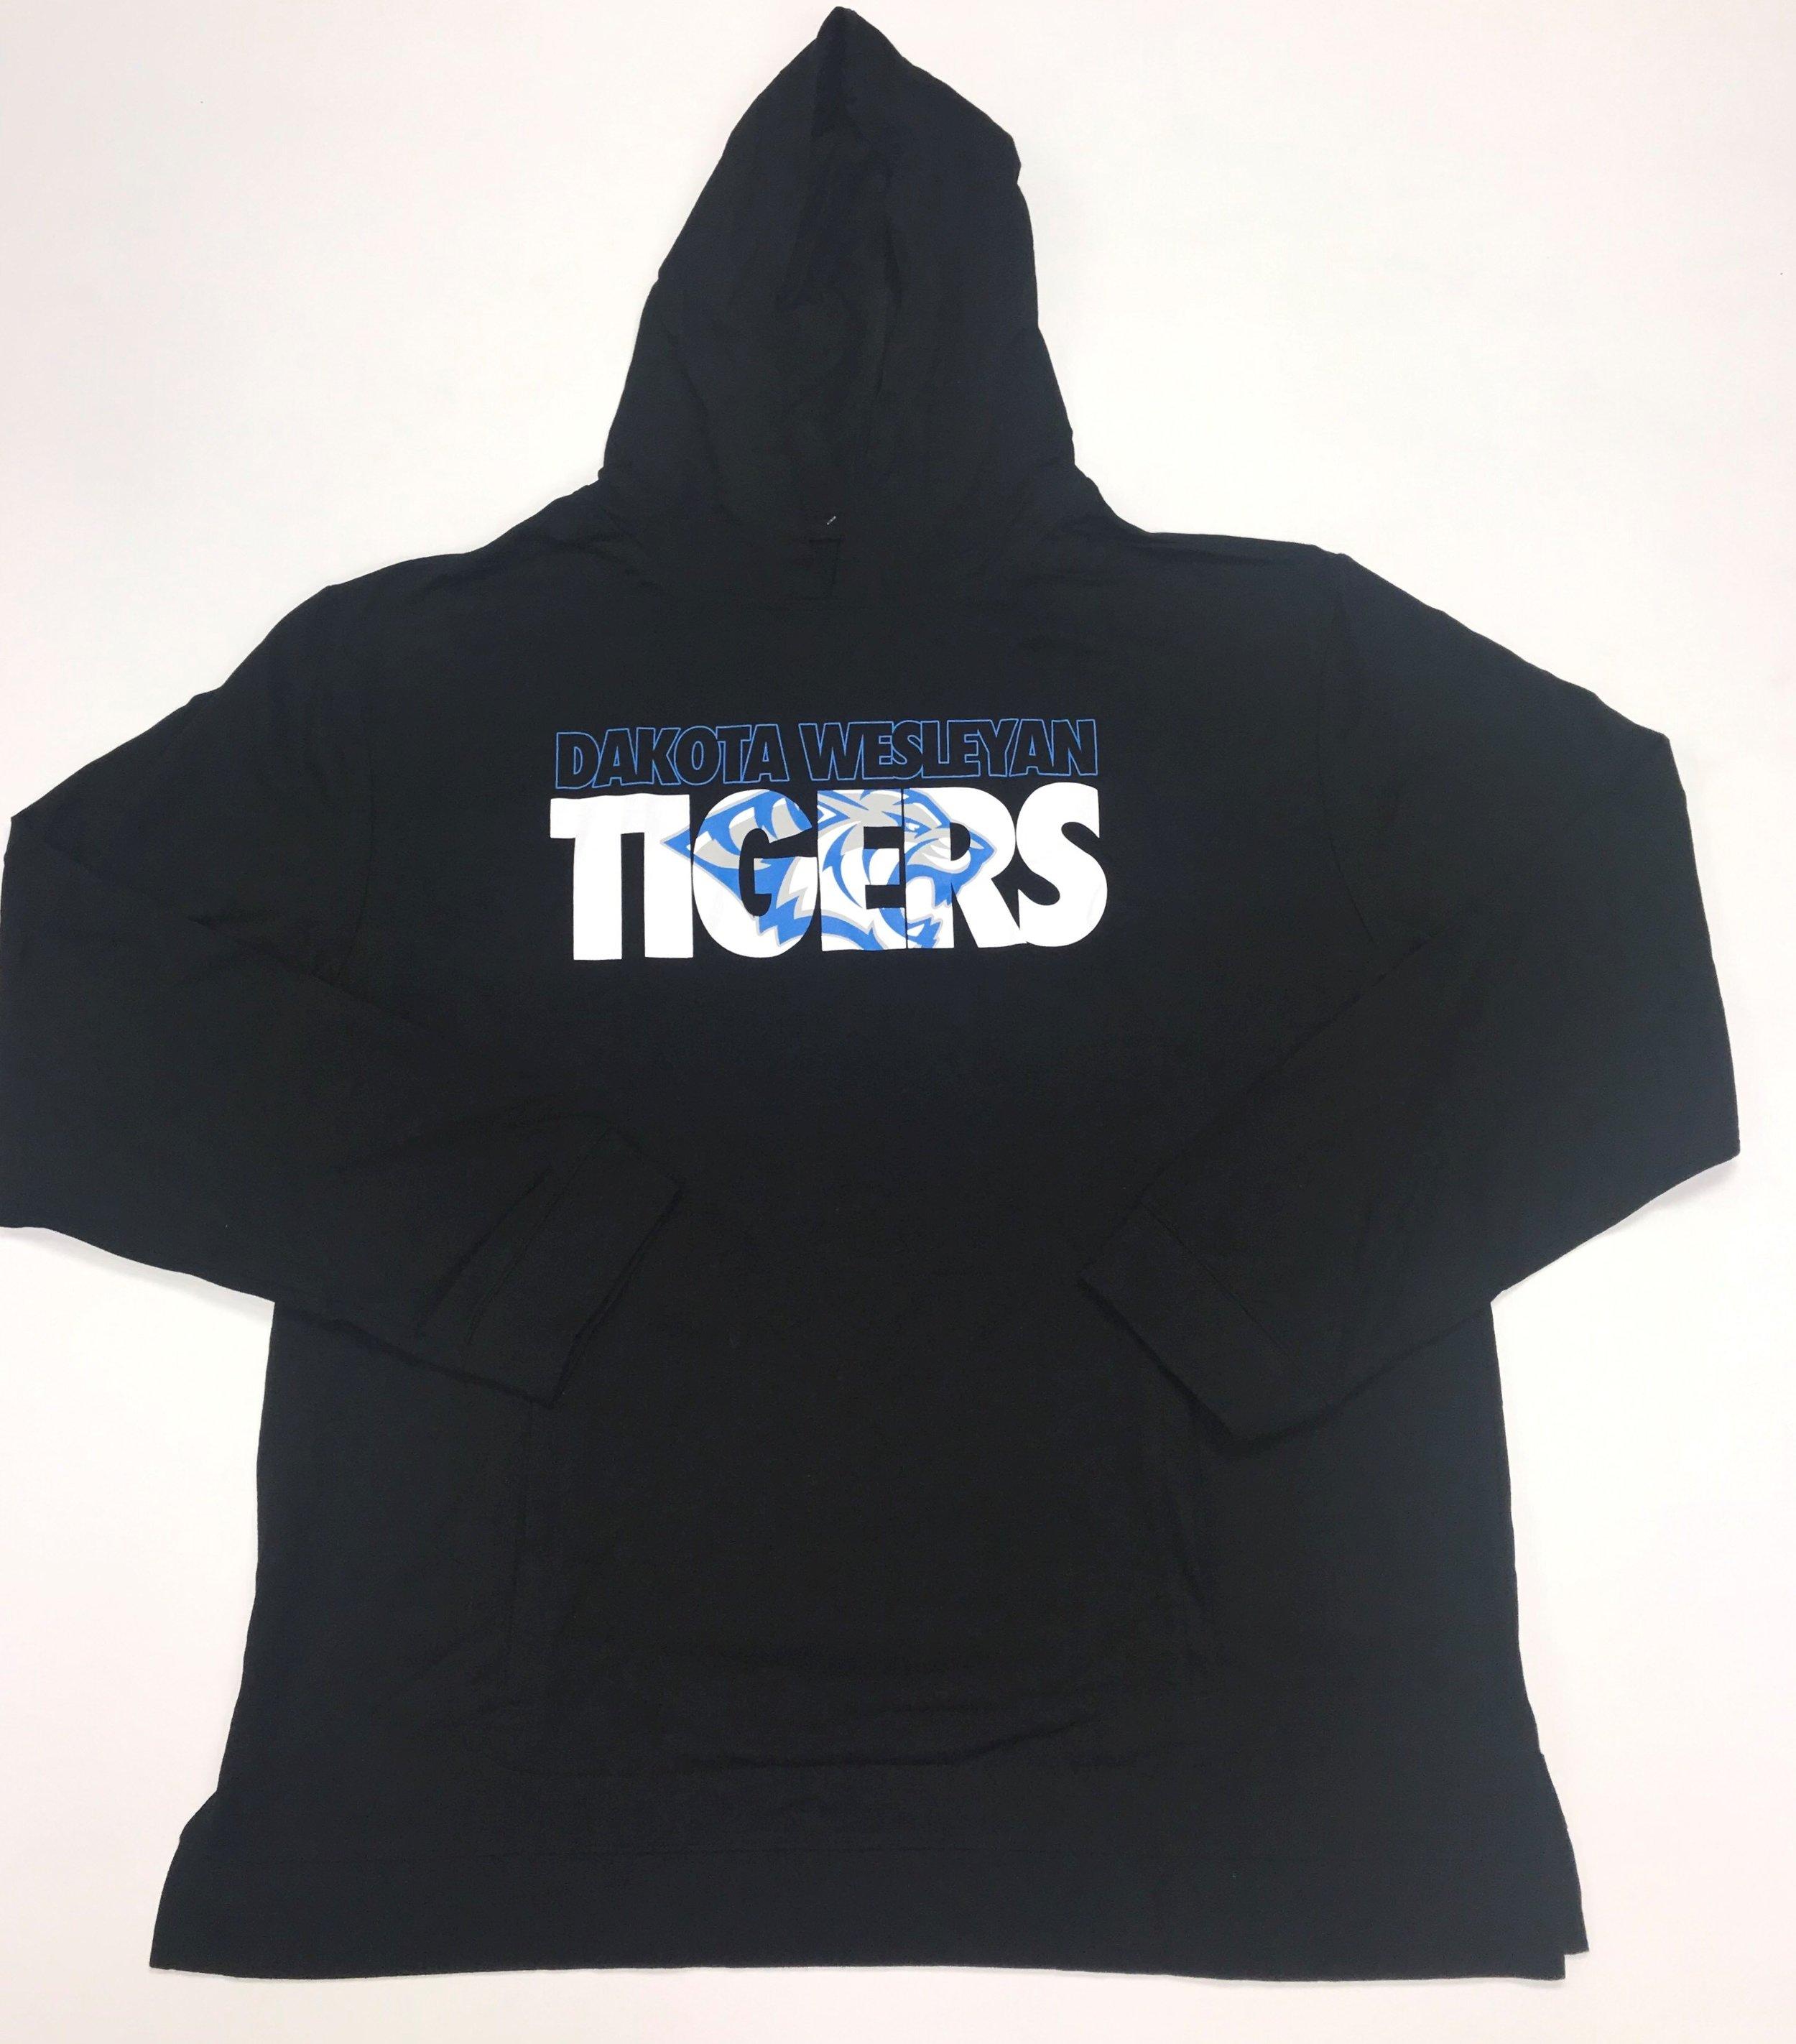 Dakota Wesleyan Tigers.jpg